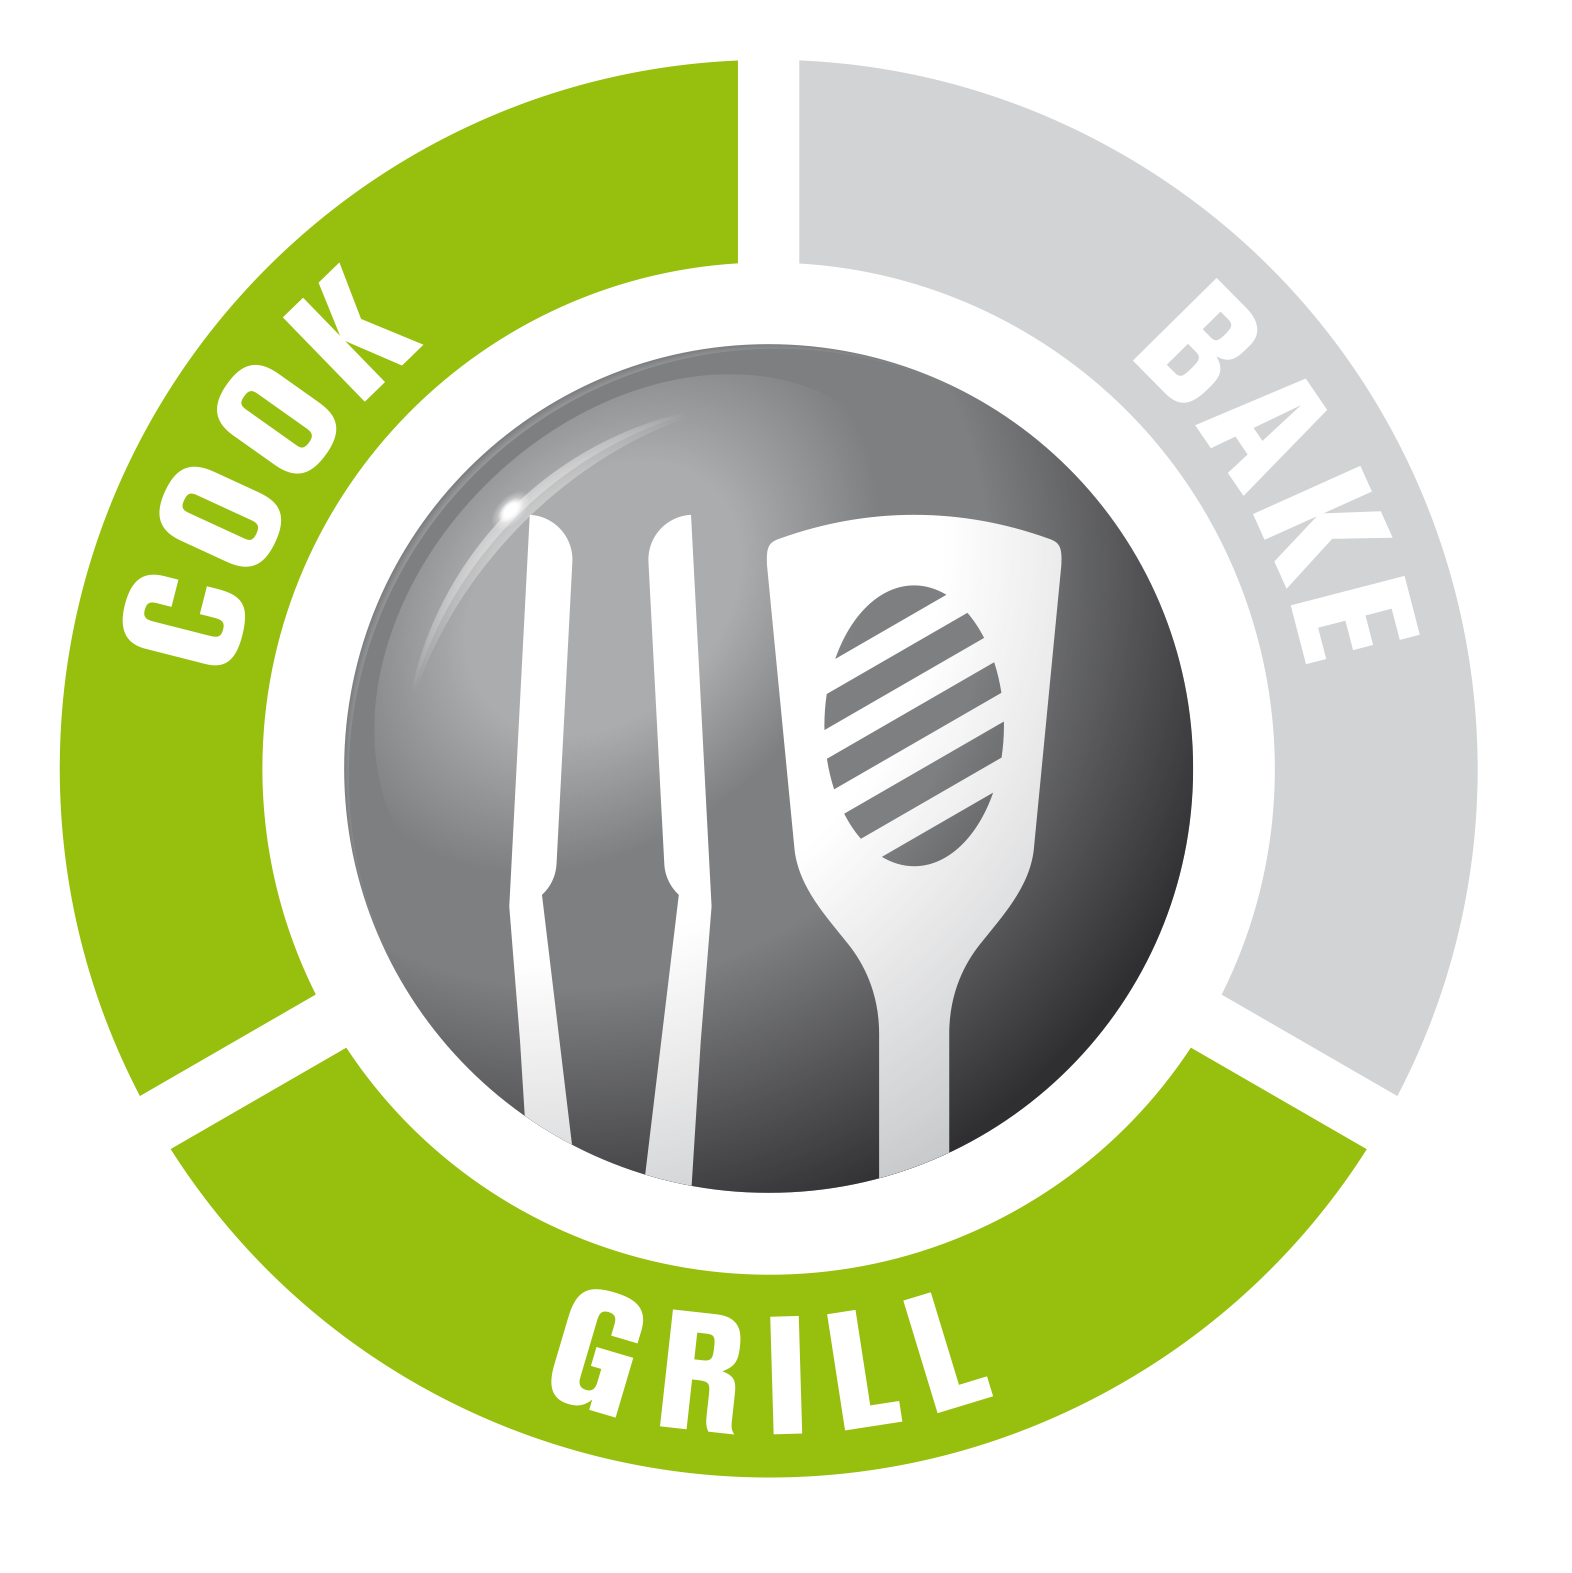 Grill & Cook - Verdon